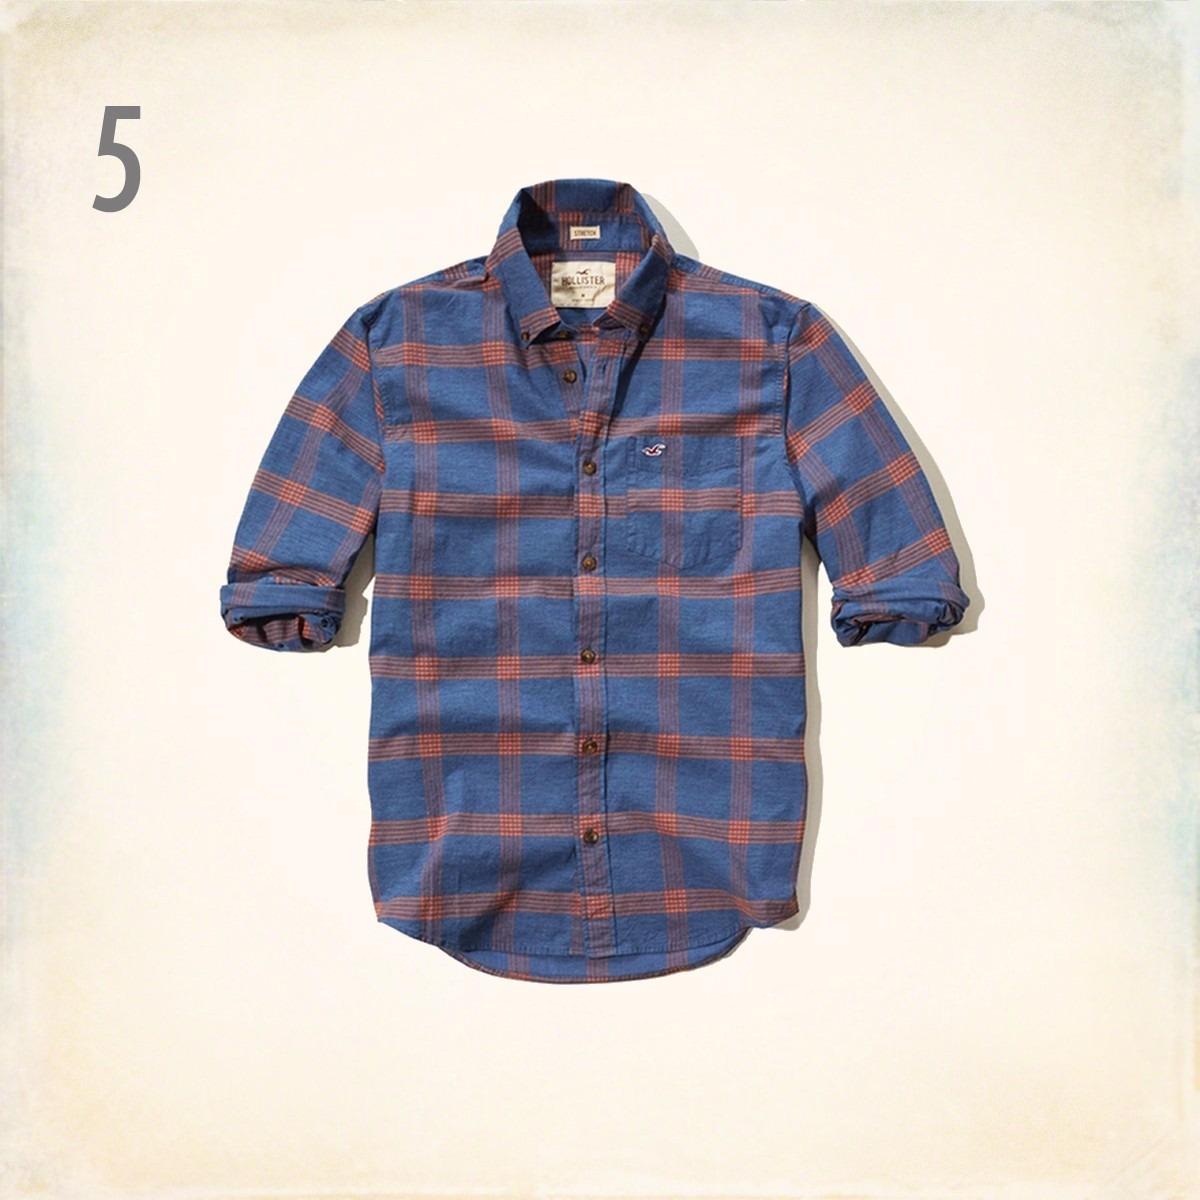 camisas hollister talla s co. original importado. Cargando zoom. 9f0c7e4021e97